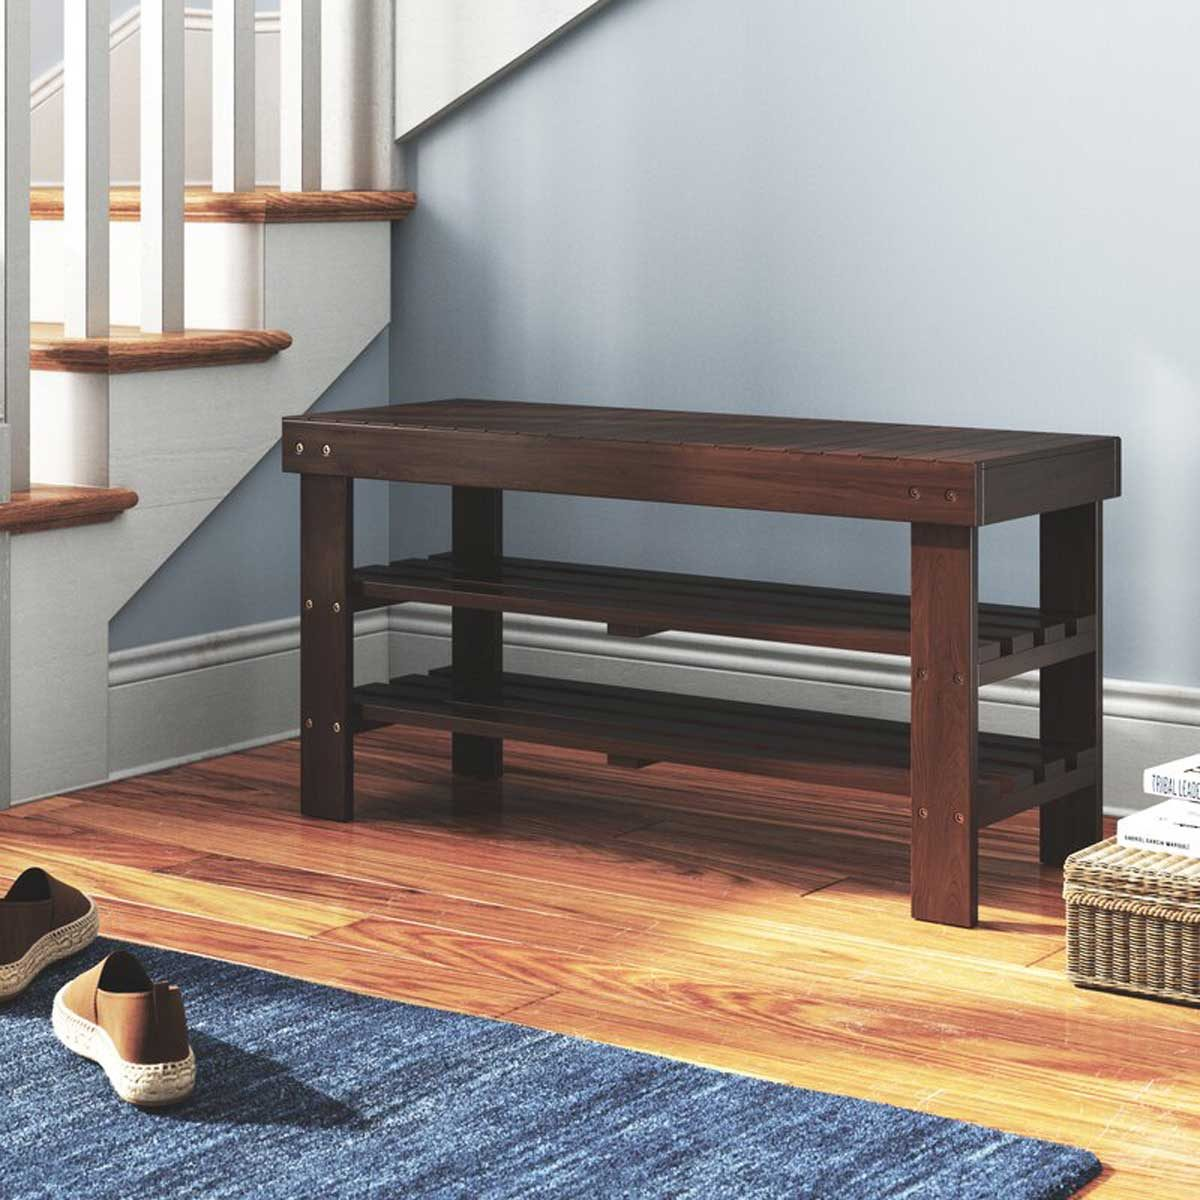 Entryway Bench Trainor+wood+shoe+storage+bench